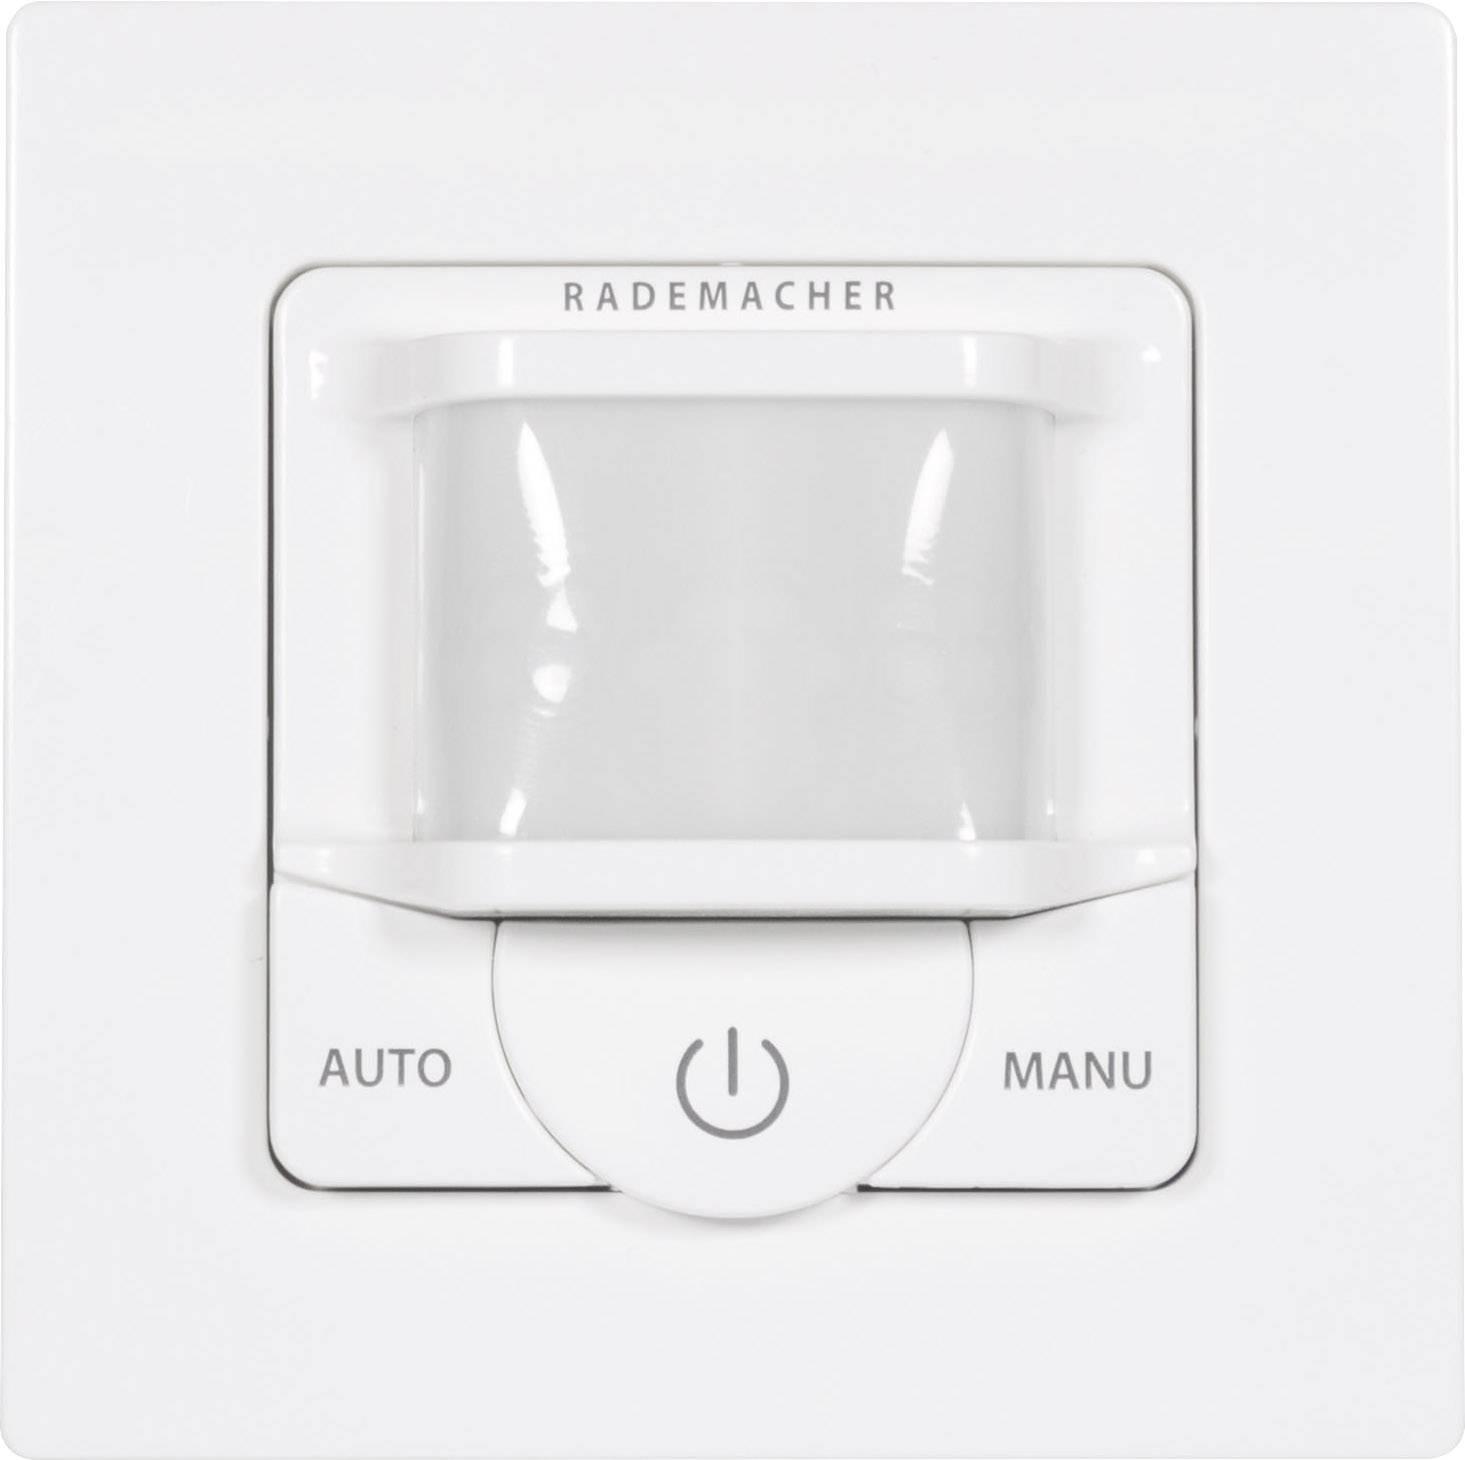 Bezdrôtový detektor pohybu zabudovateľný WR Rademacher Rademacher DuoFern 9484